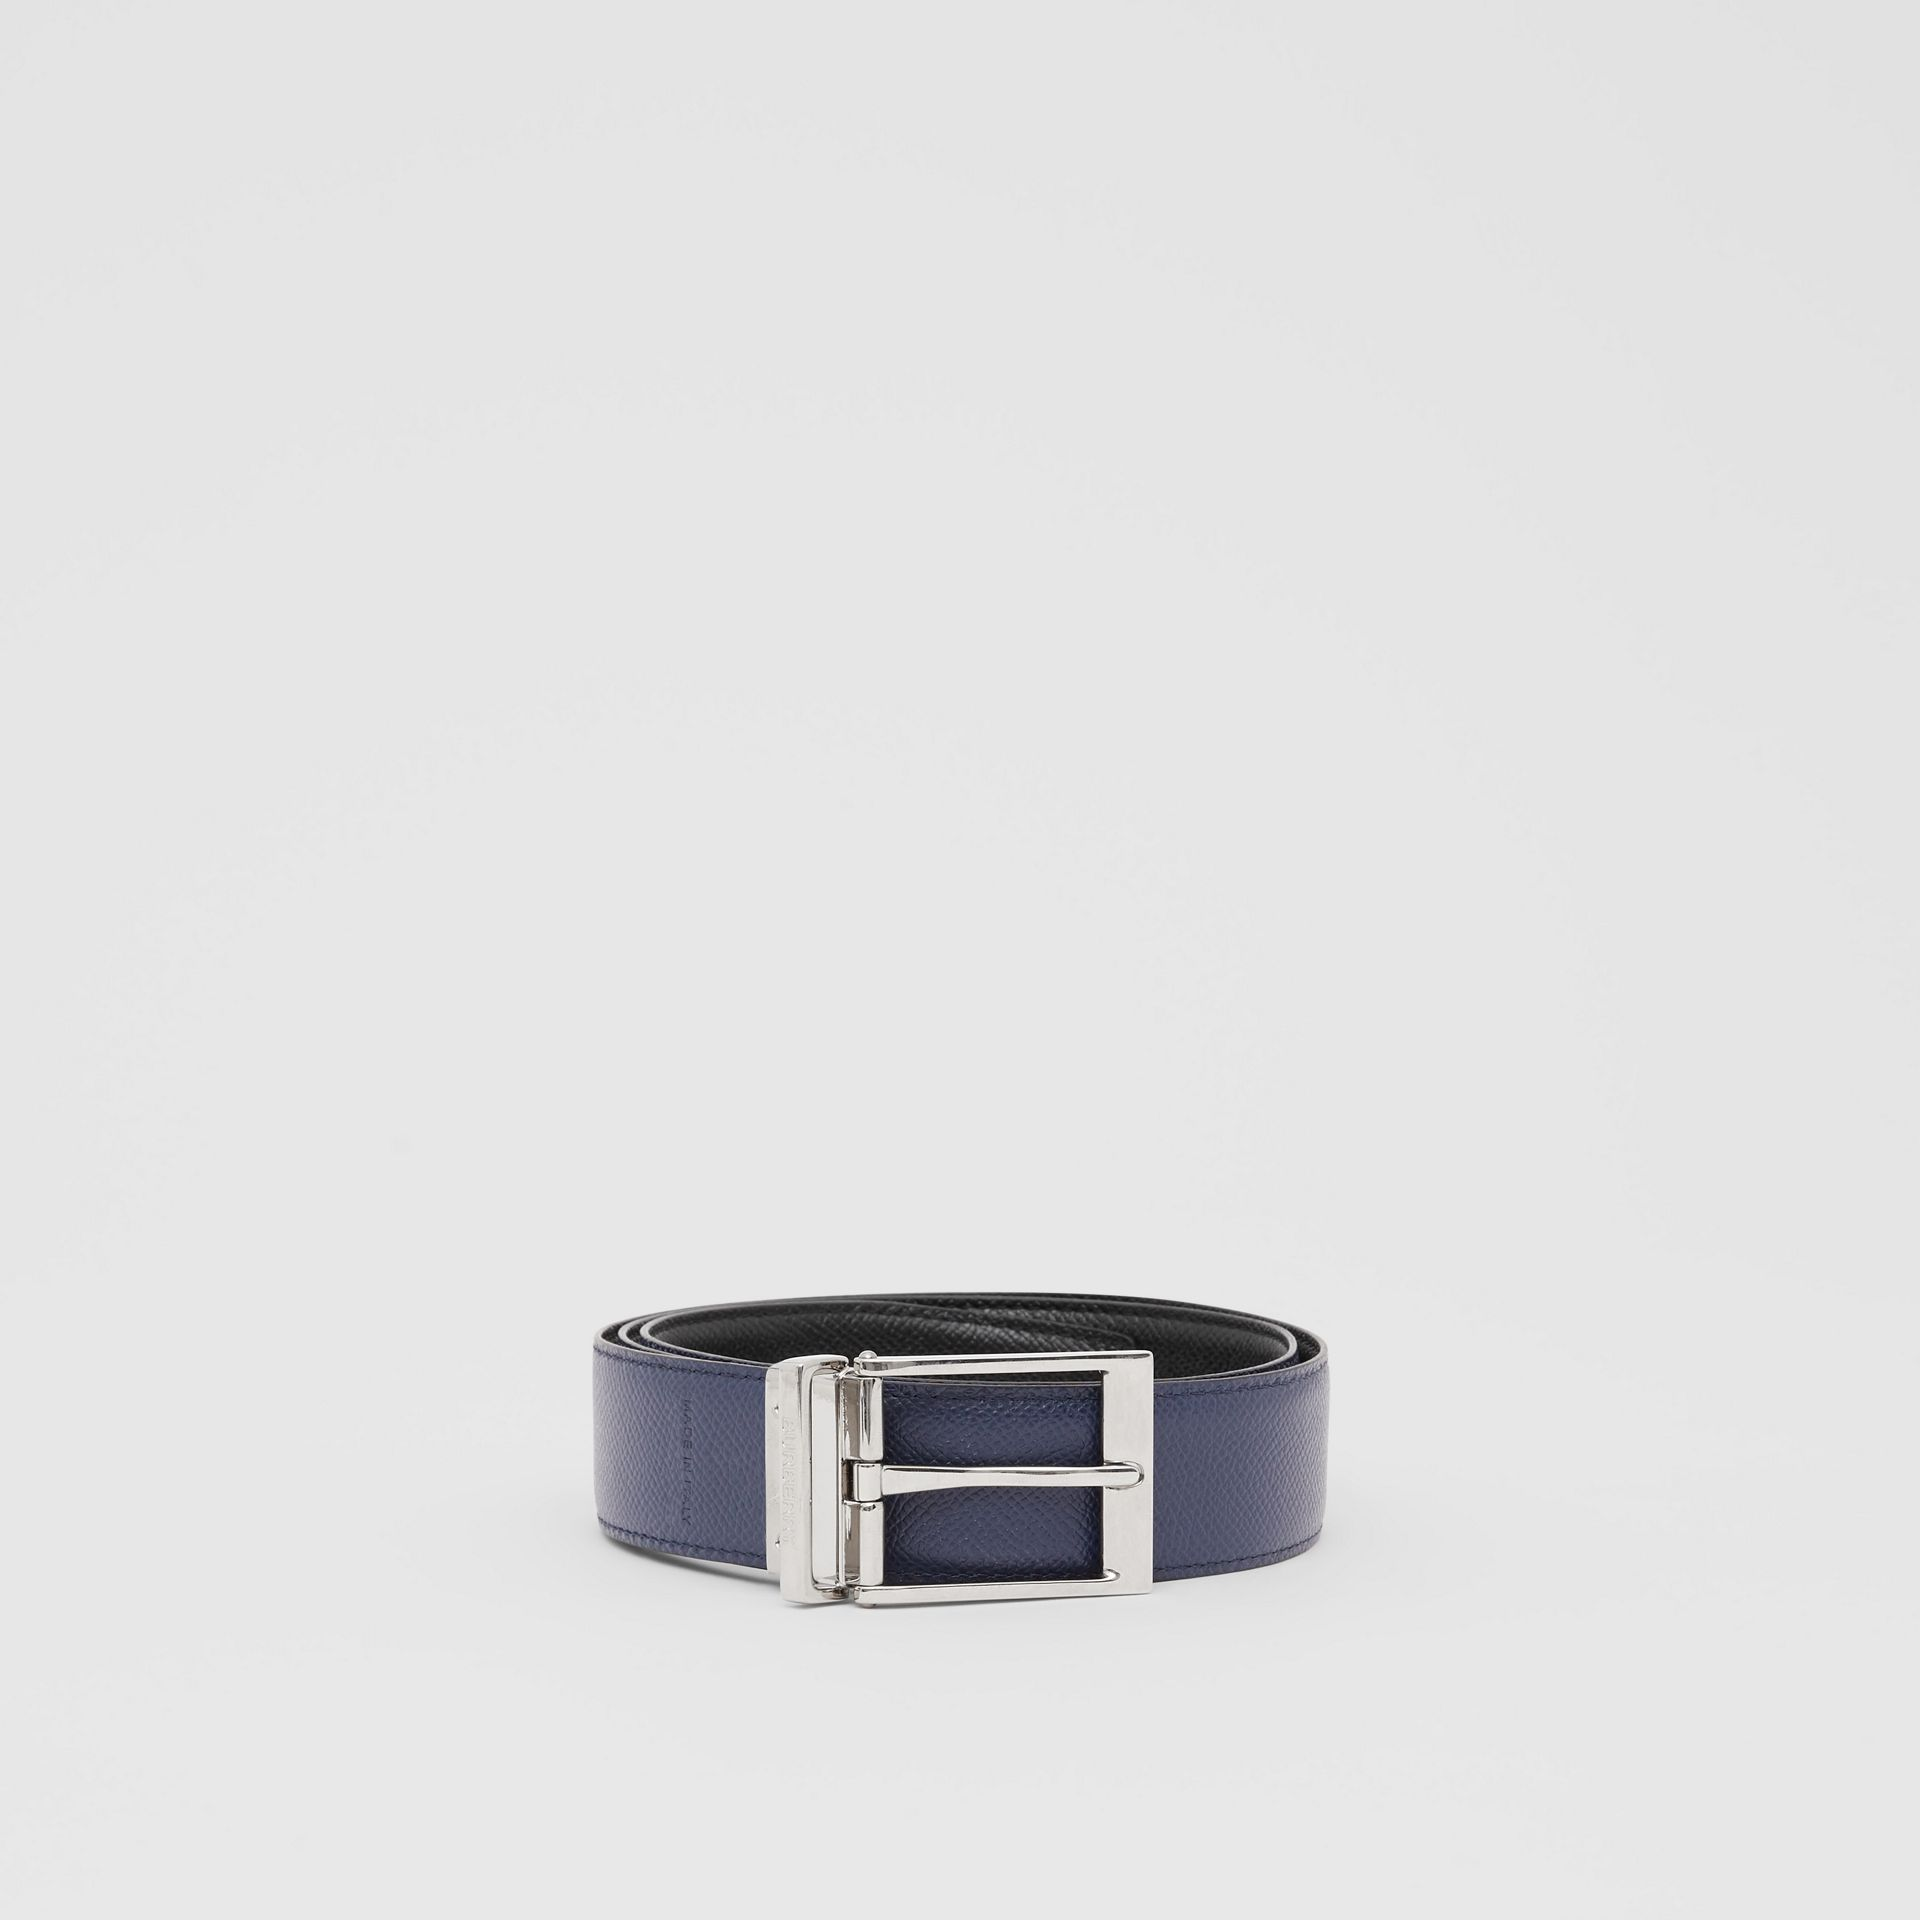 Reversible Grainy Leather Belt in Navy/black - Men | Burberry - gallery image 5